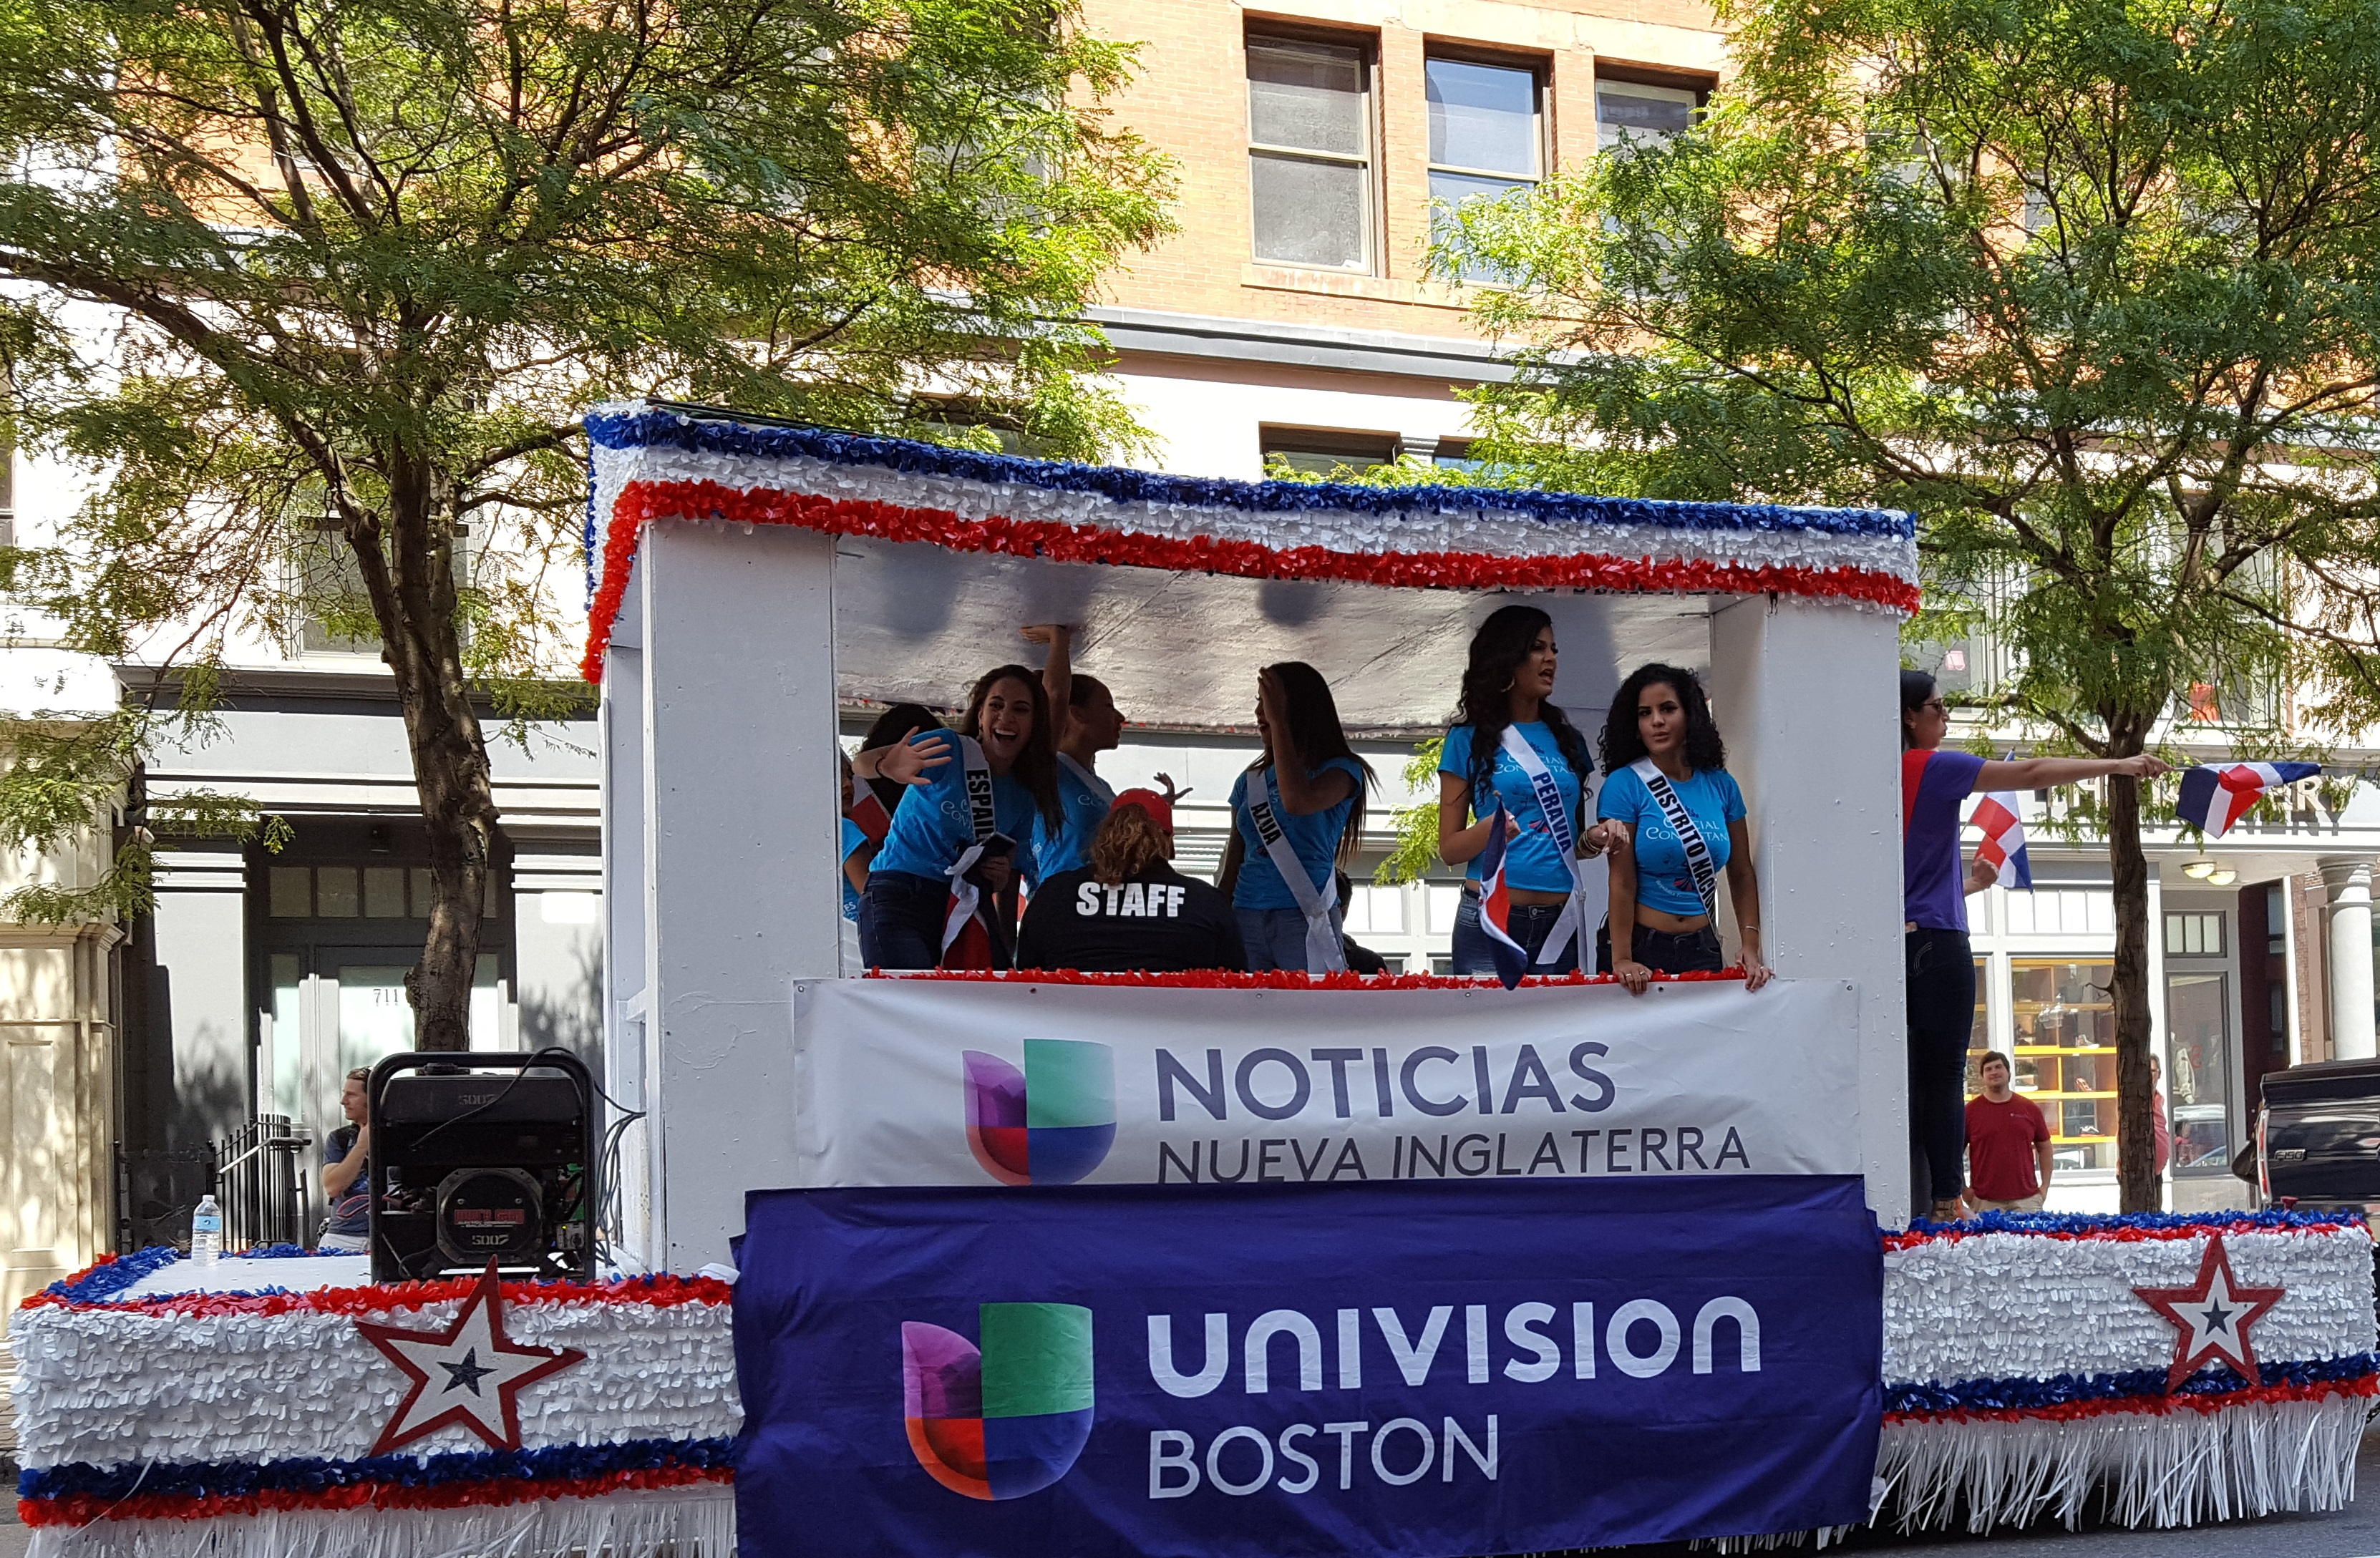 Univision Wikiwand